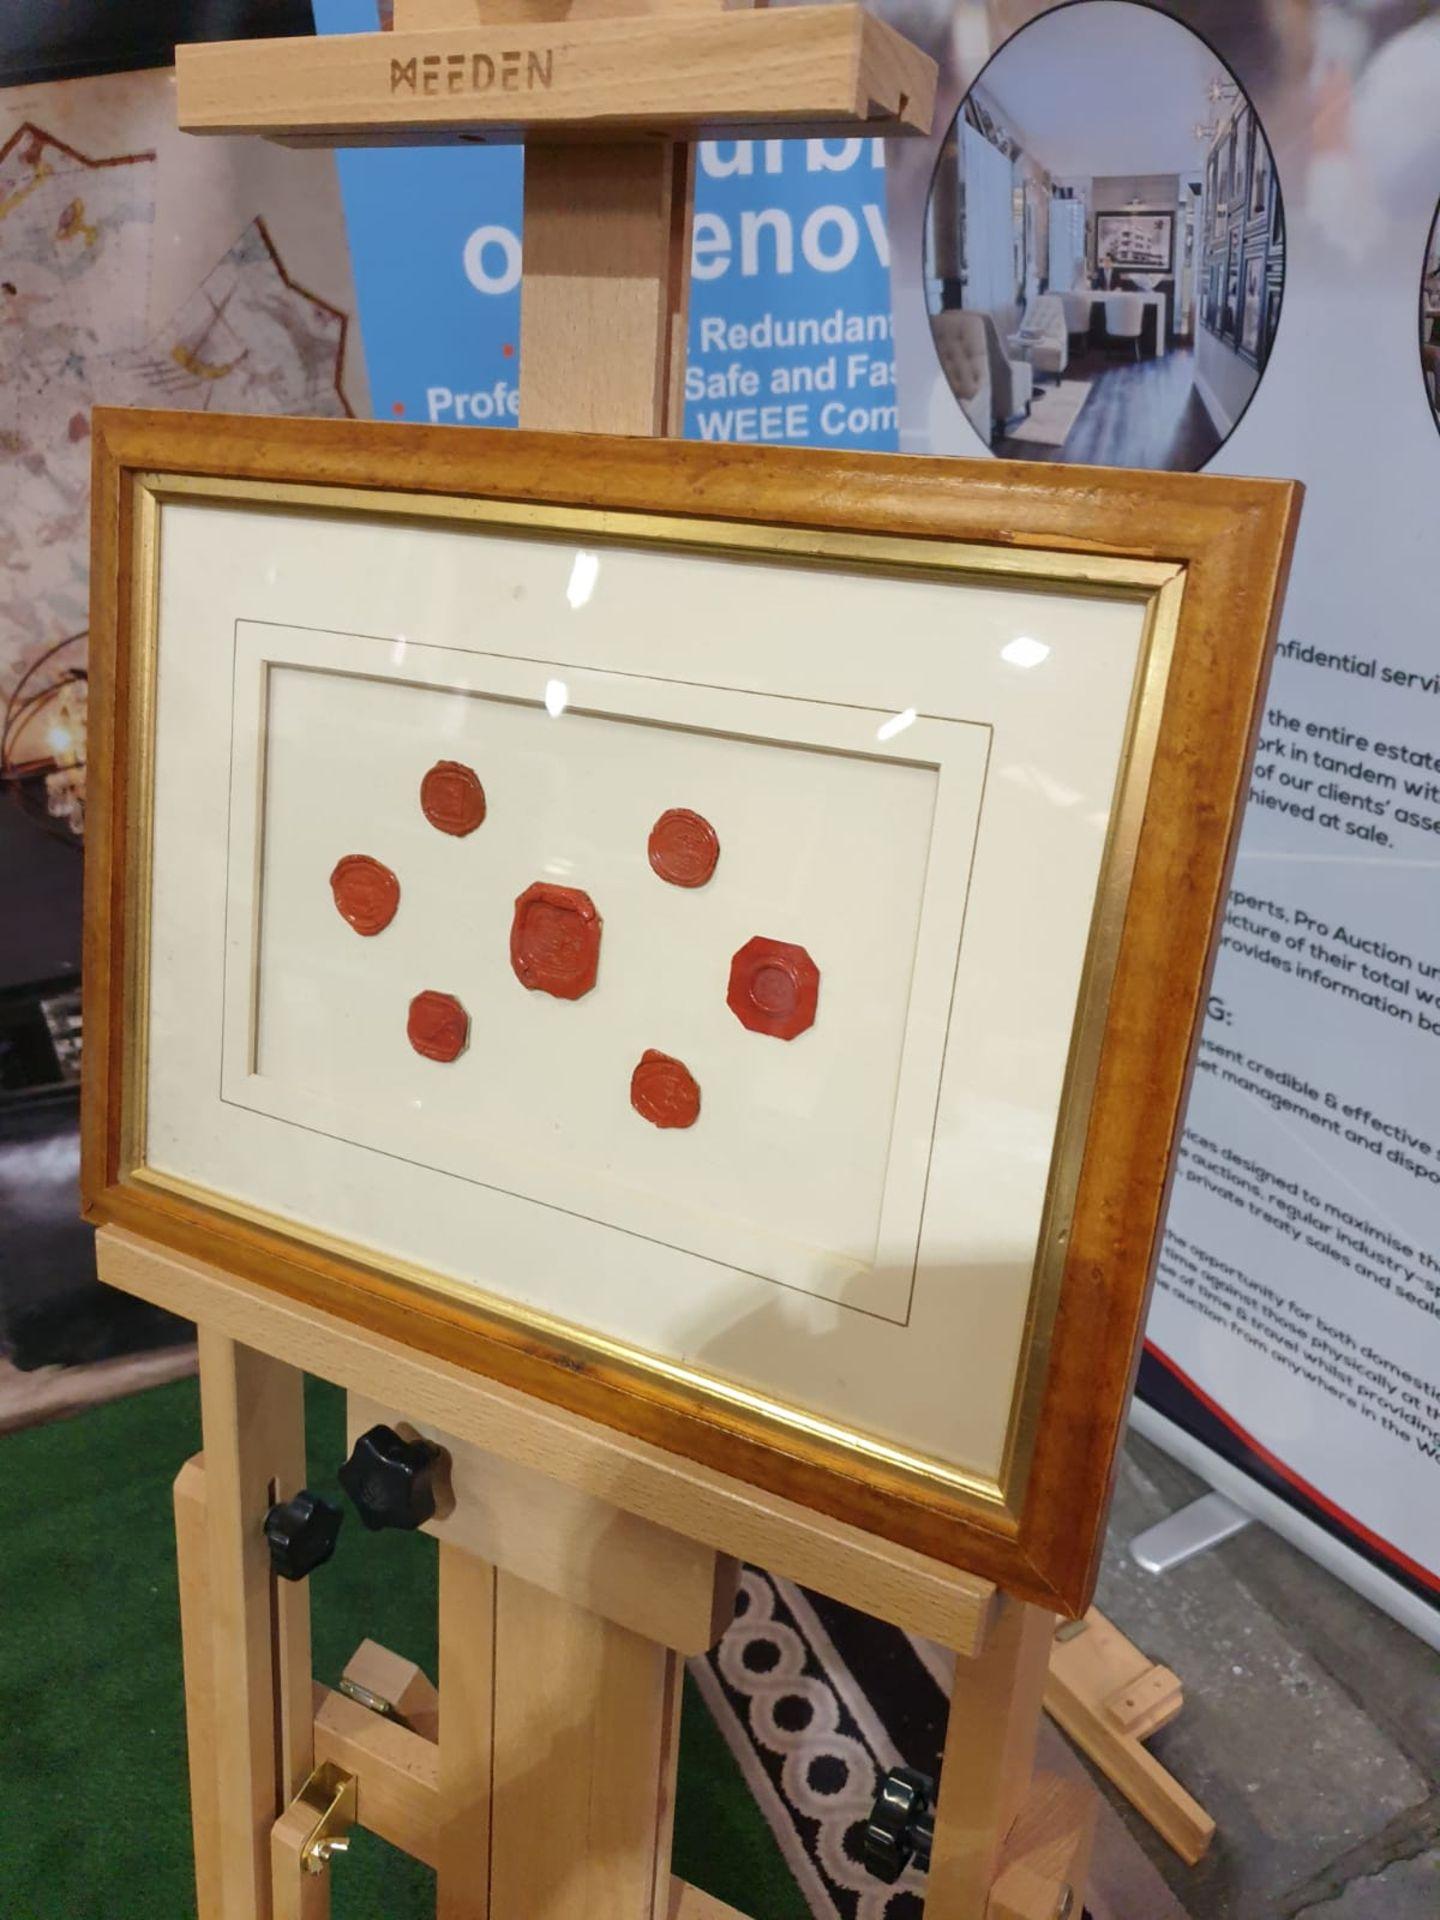 Framed artwork of wax Seals in Wood frame 42 x 32cm - Image 2 of 4